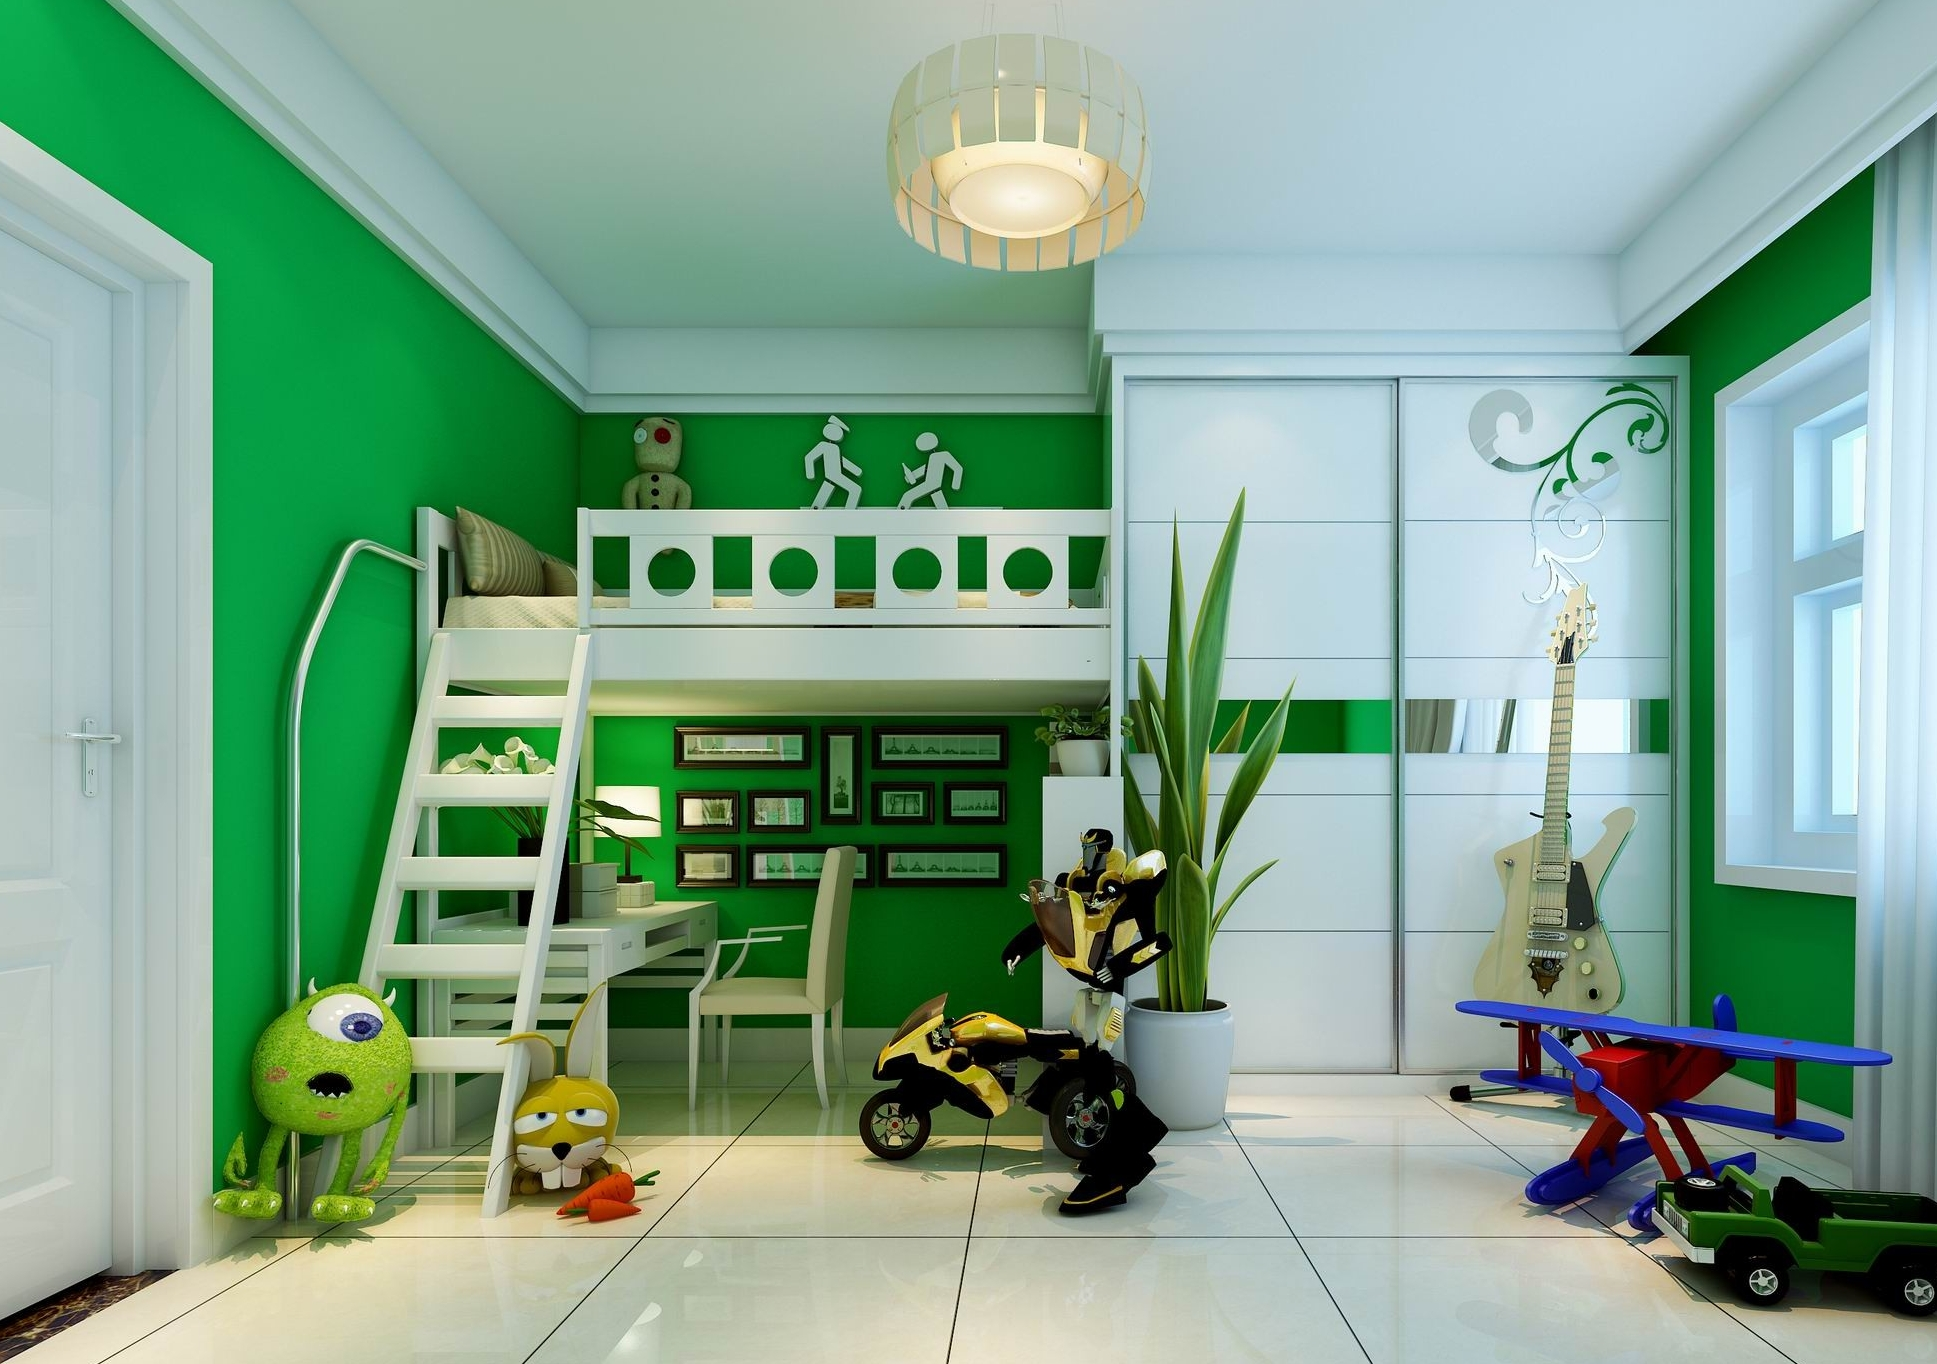 Modern Kid Bedroom Modern Kids Bedroom With Wooden Floor Fully Furnished 3d Model Max